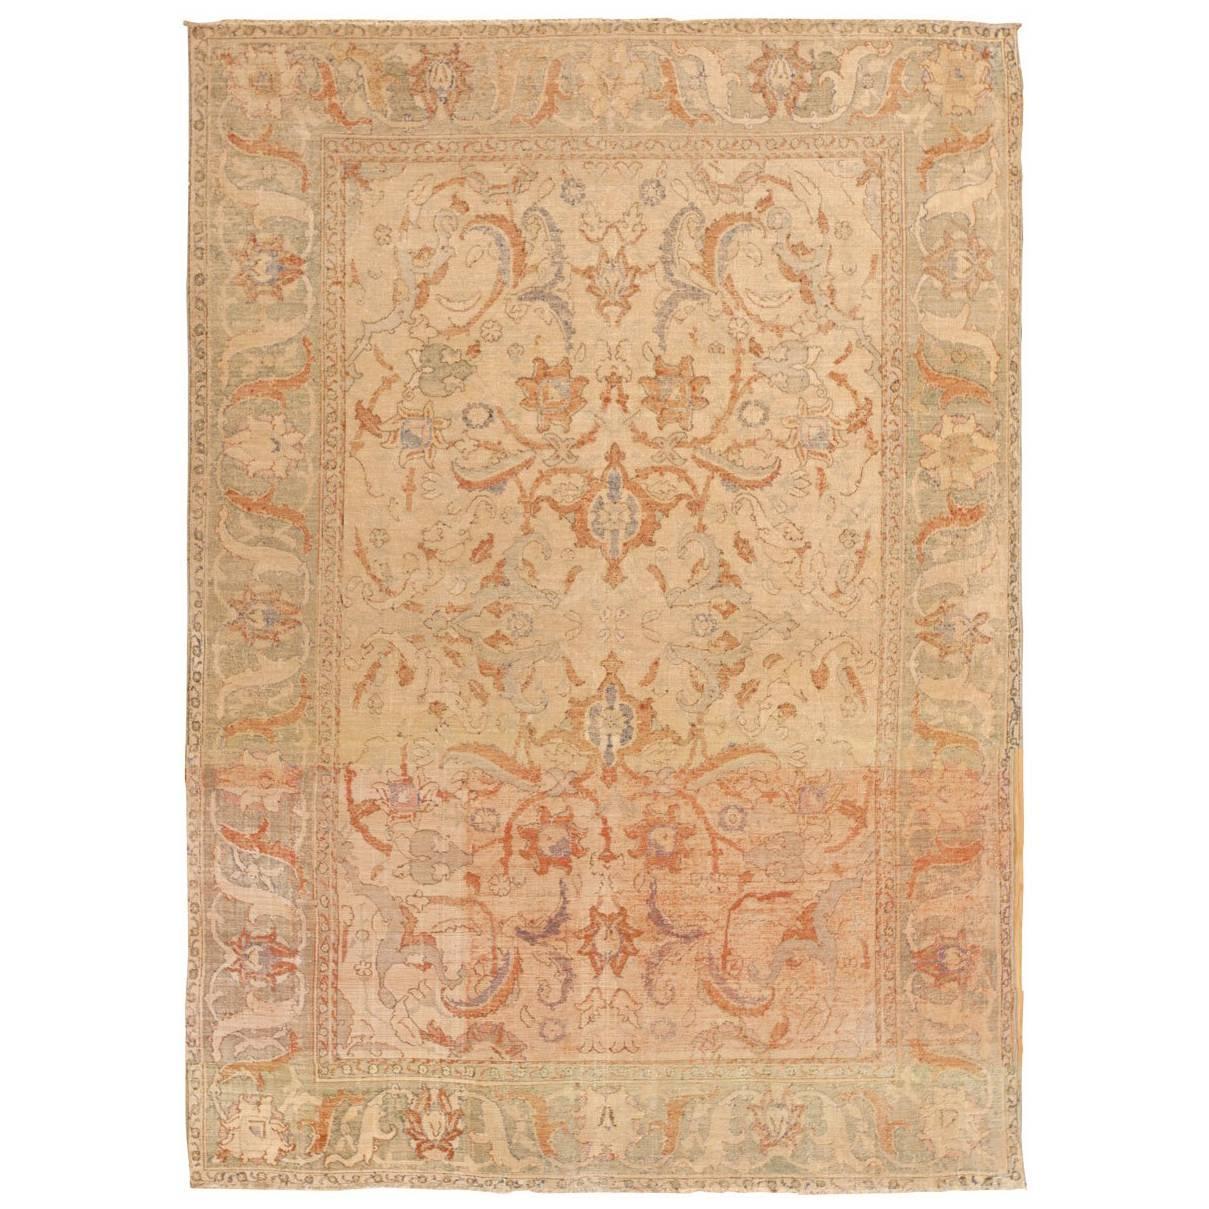 Polonaise antique oriental rugs - Polonaise Antique Oriental Rugs 8